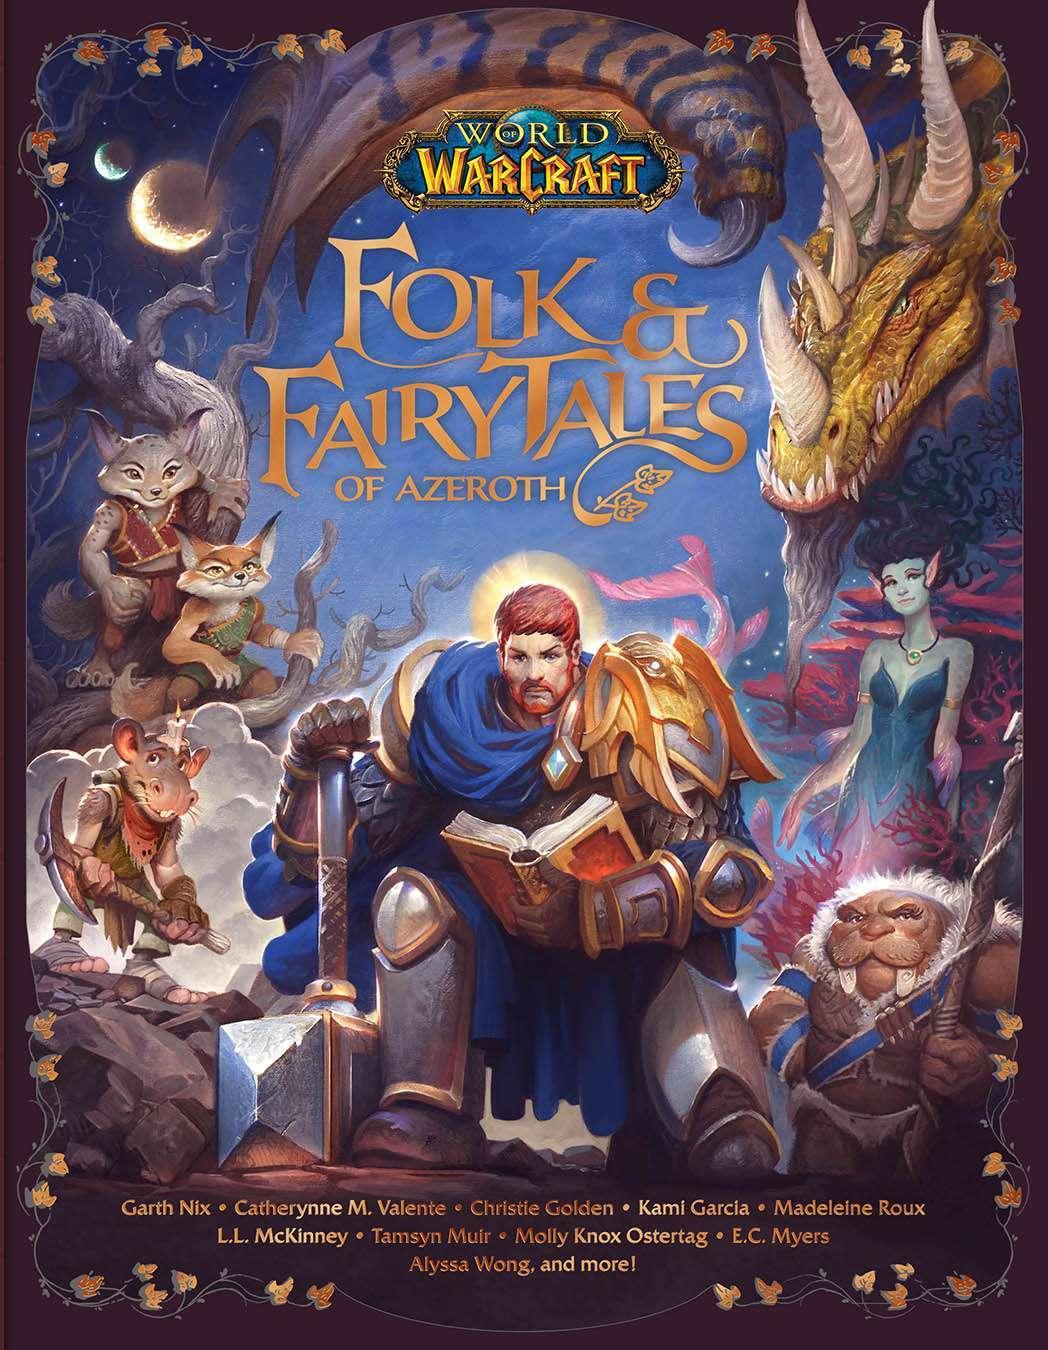 World of Warcraft - Folk & Fairytales of Azeroth